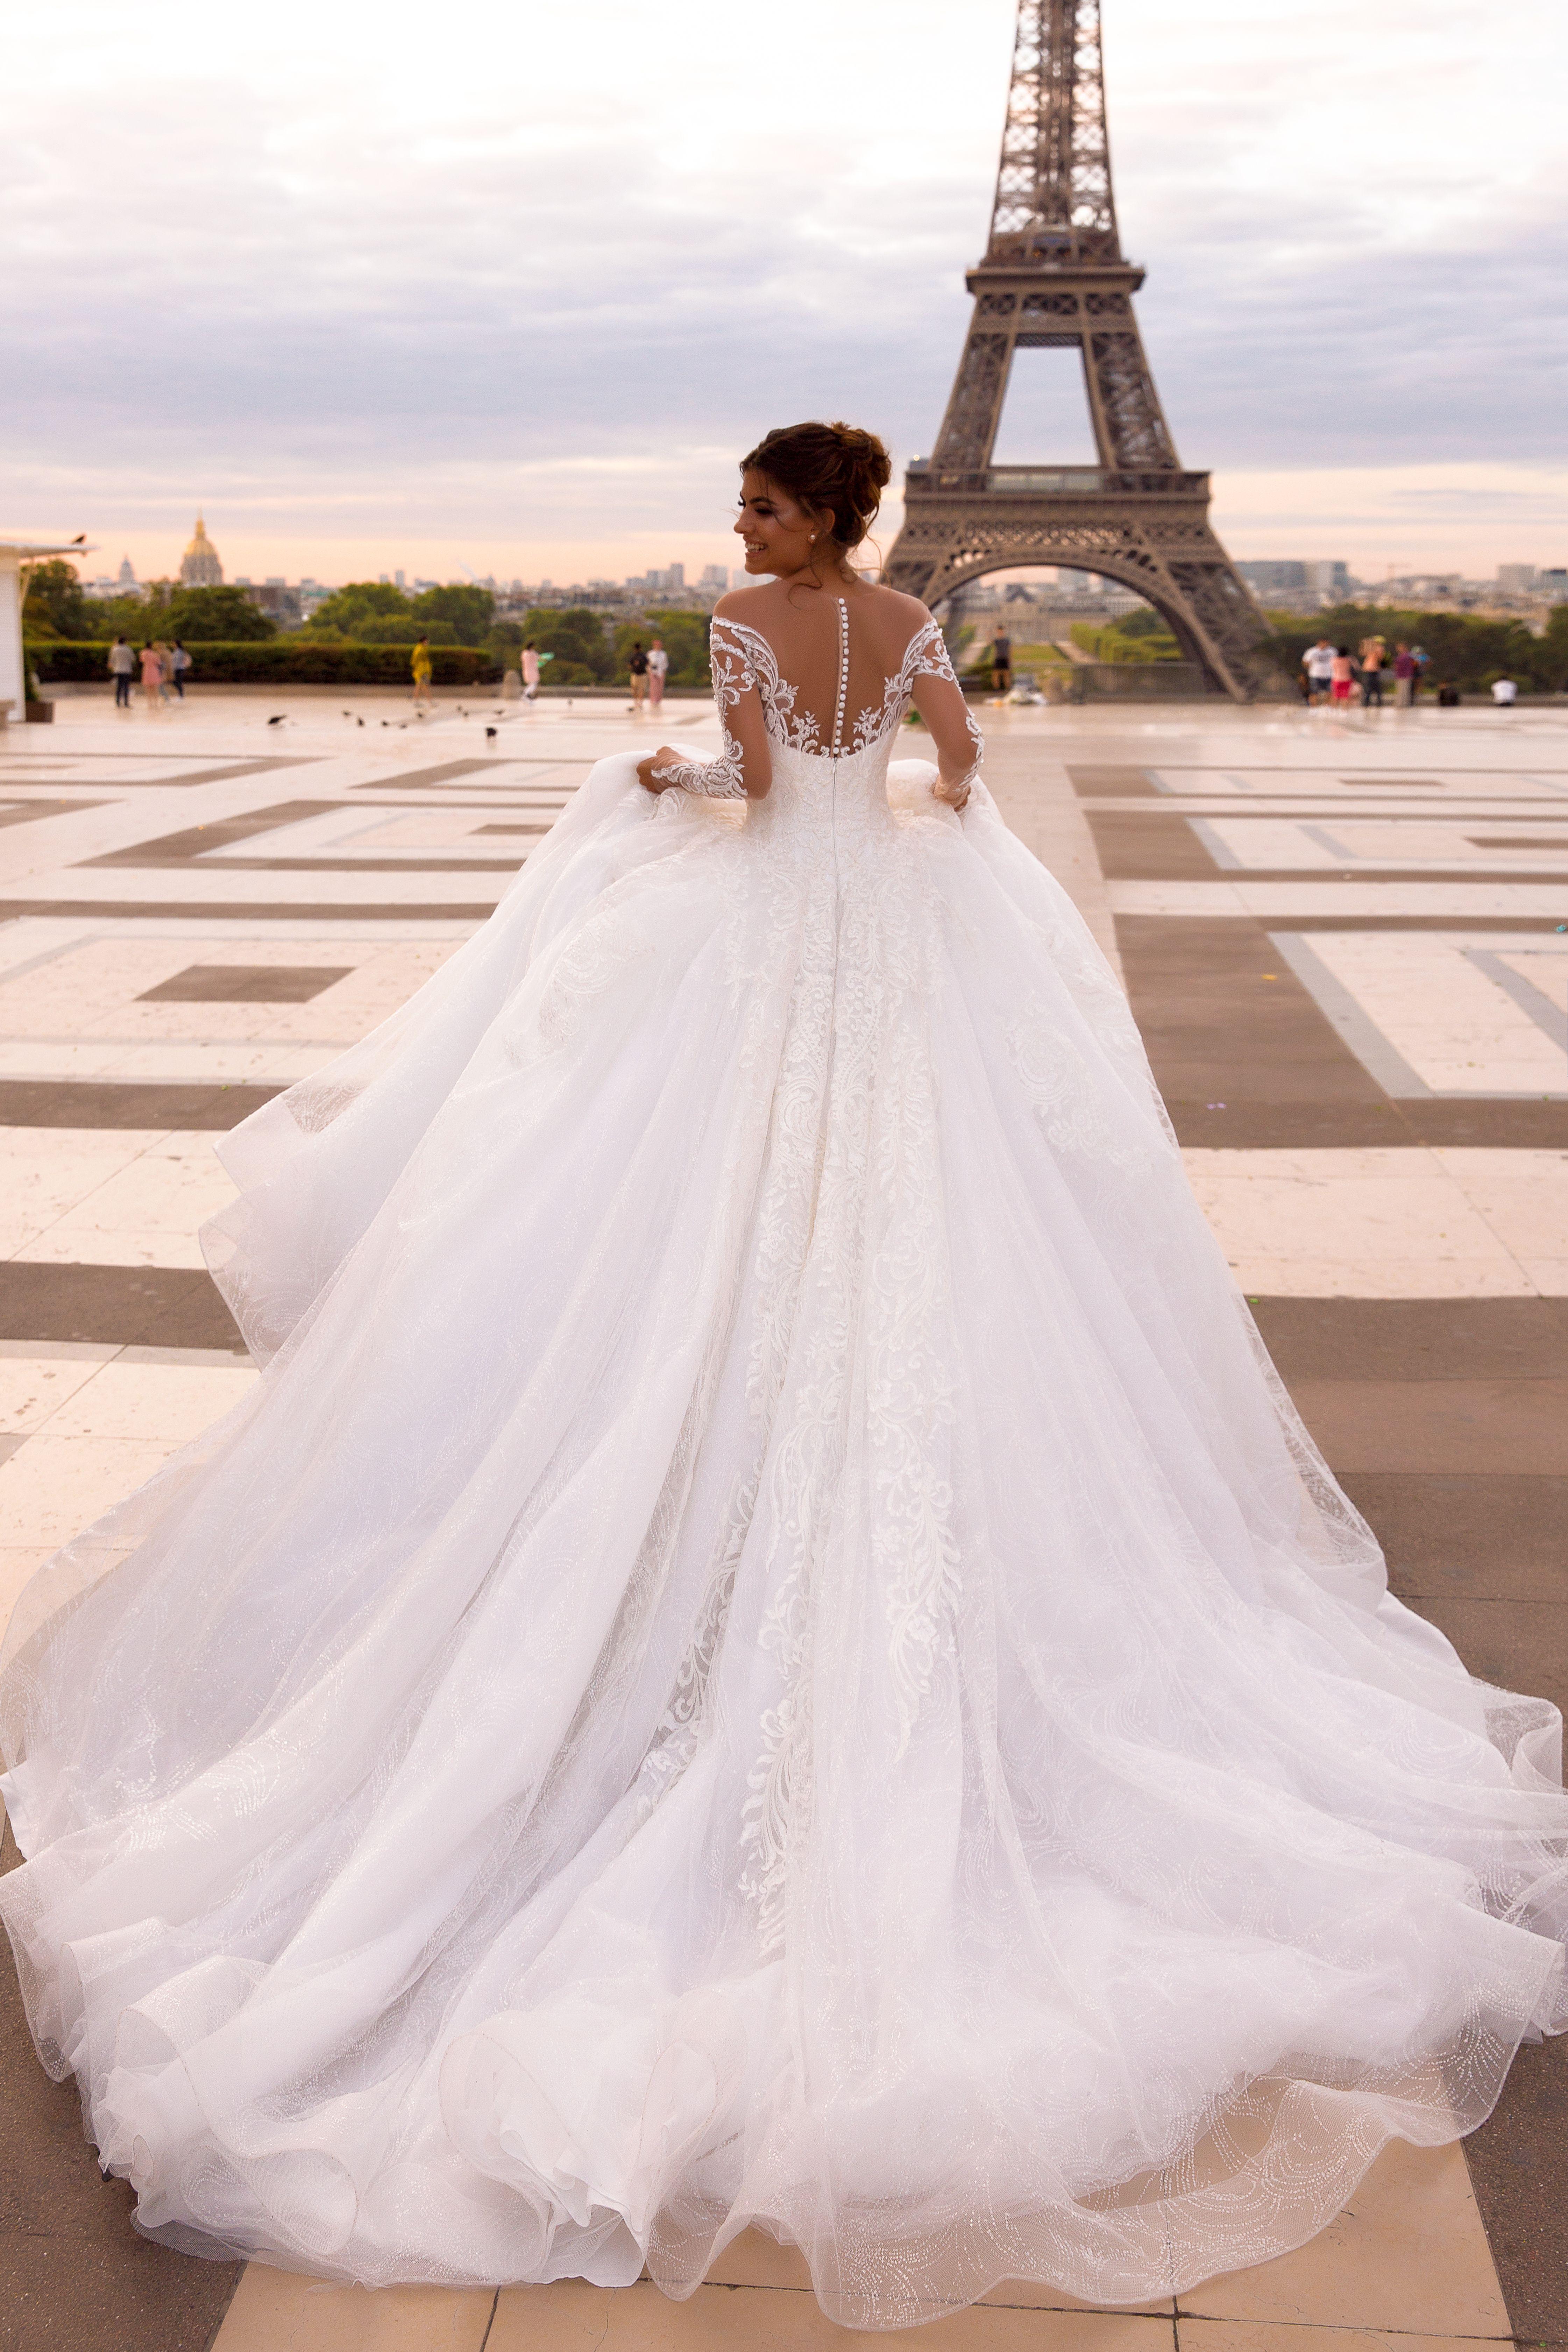 Wedding Gown Regina For Your Special Day In 2020 Flower Girl Dresses Tutu Ivory Girls Dress Satin Girls Dress